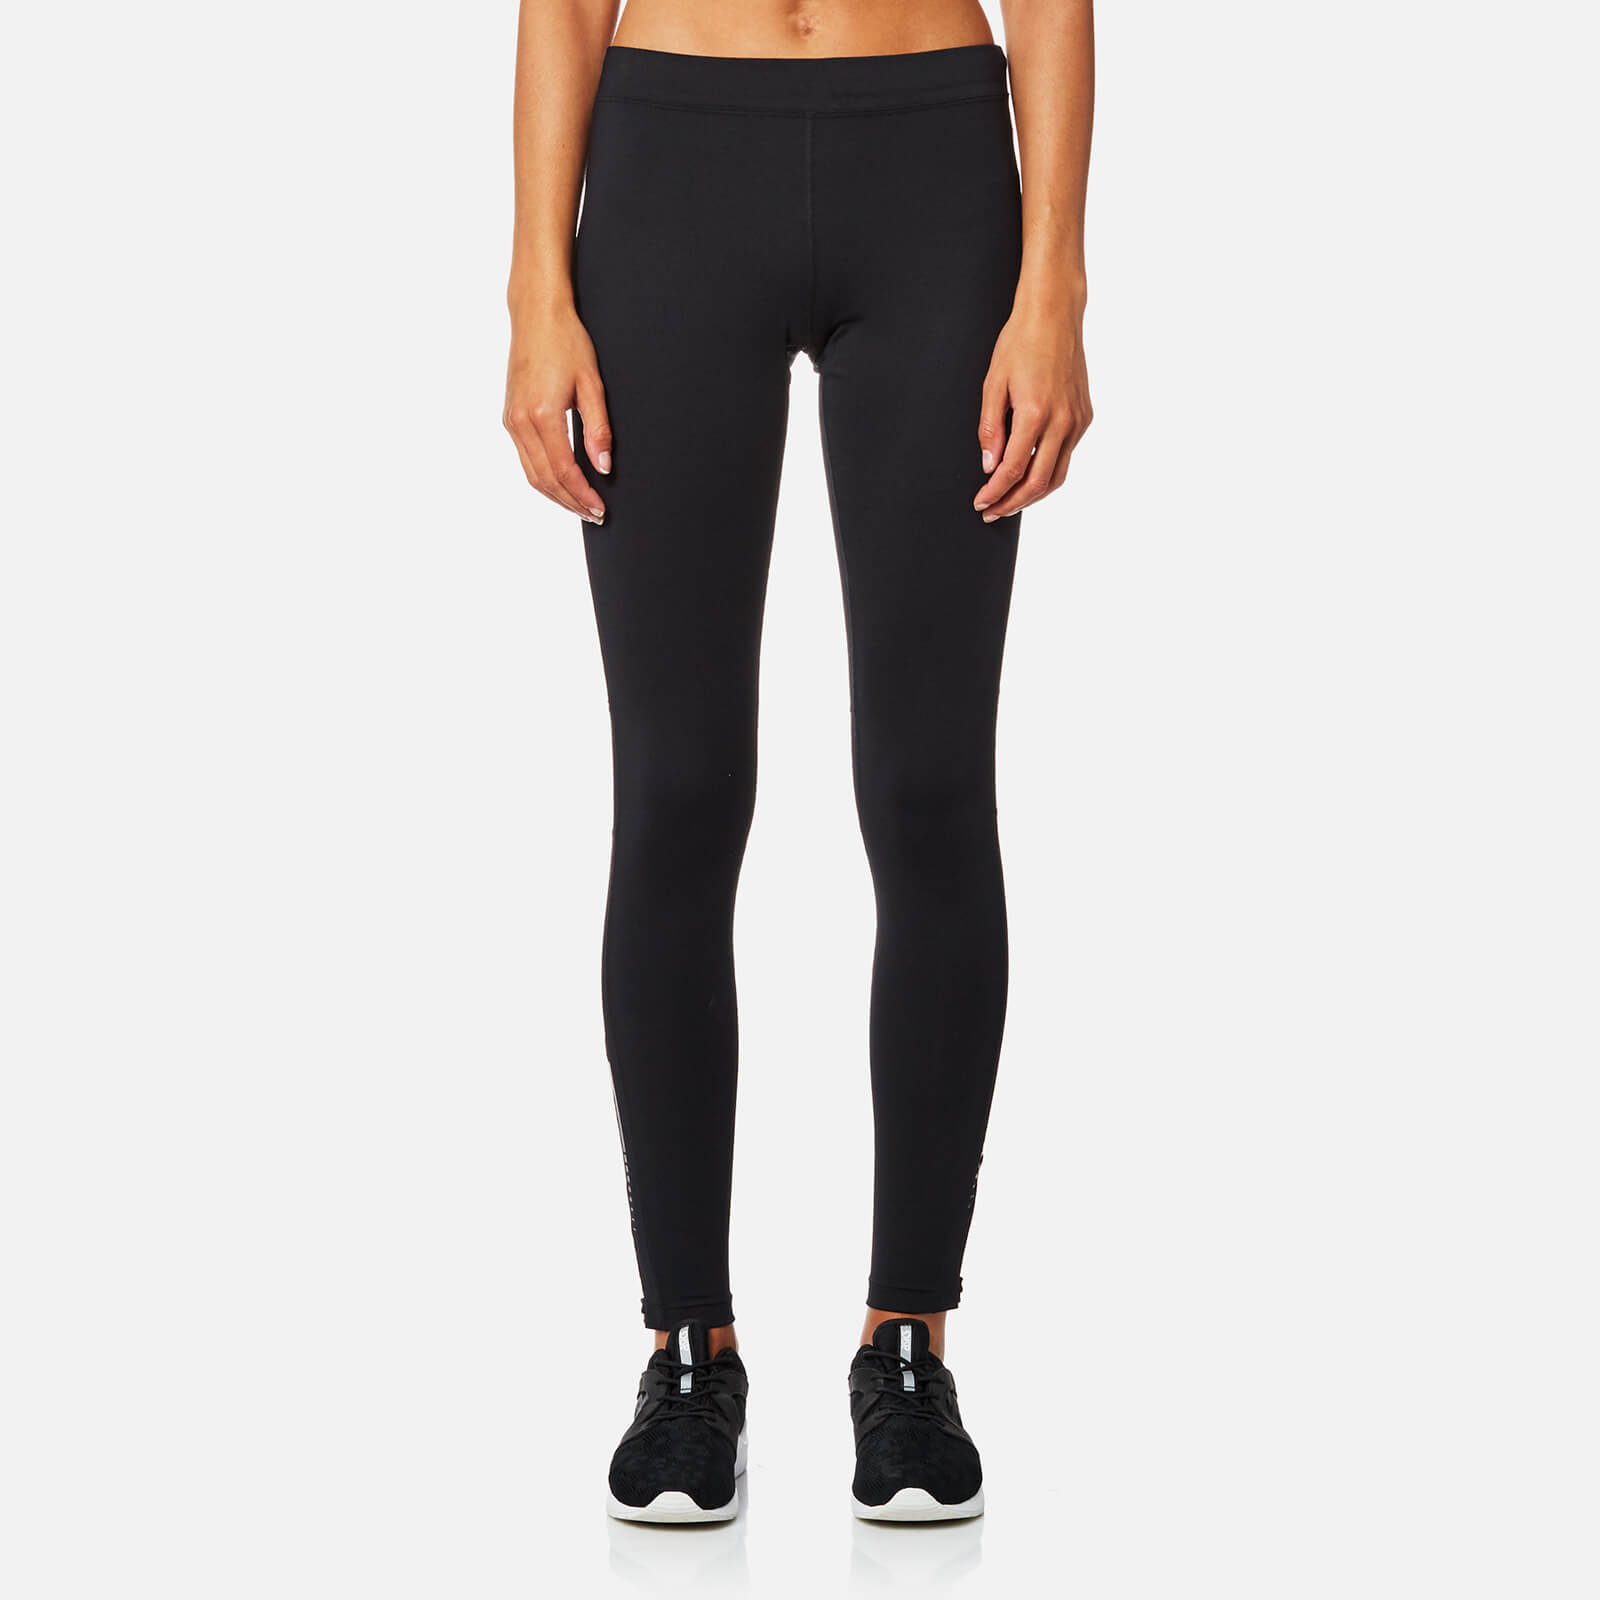 90c6541c4009 Asics Women s Running Tights - Performance Black